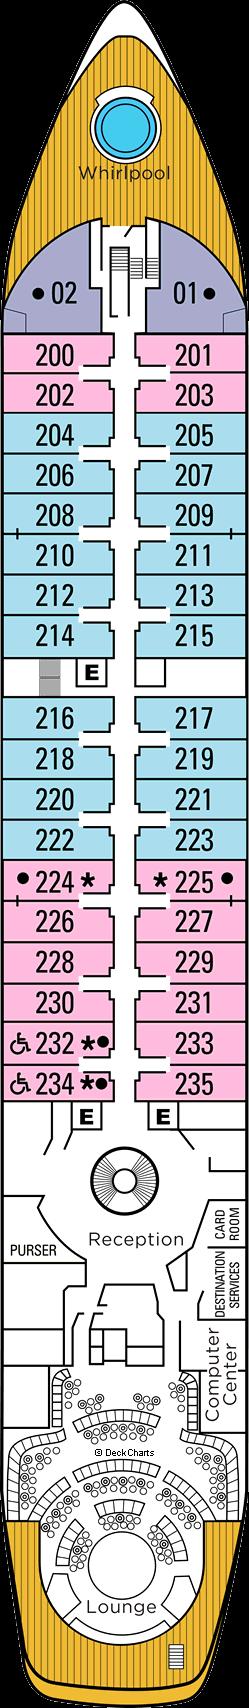 Star Breeze: Deck 5